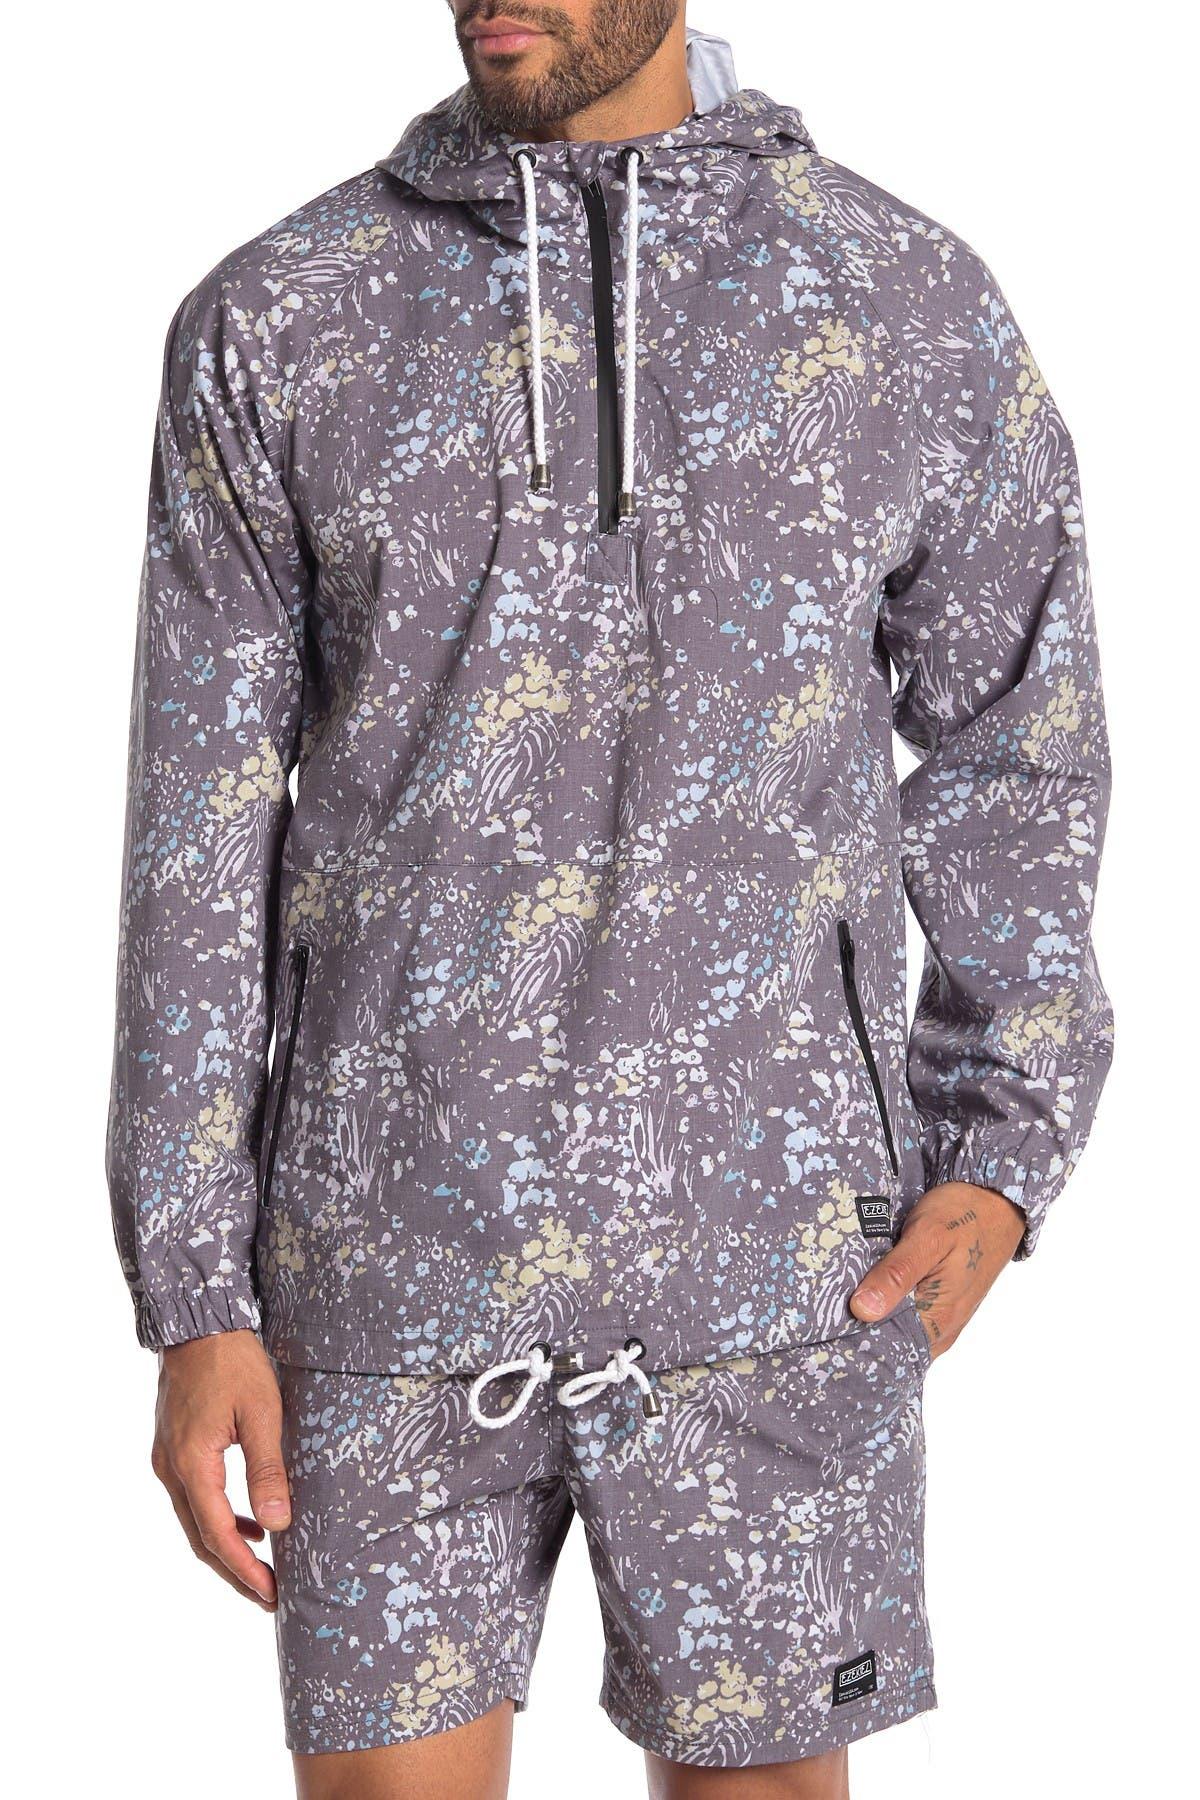 Image of Ezekiel Panther Quarter Zip Hooded Jacket